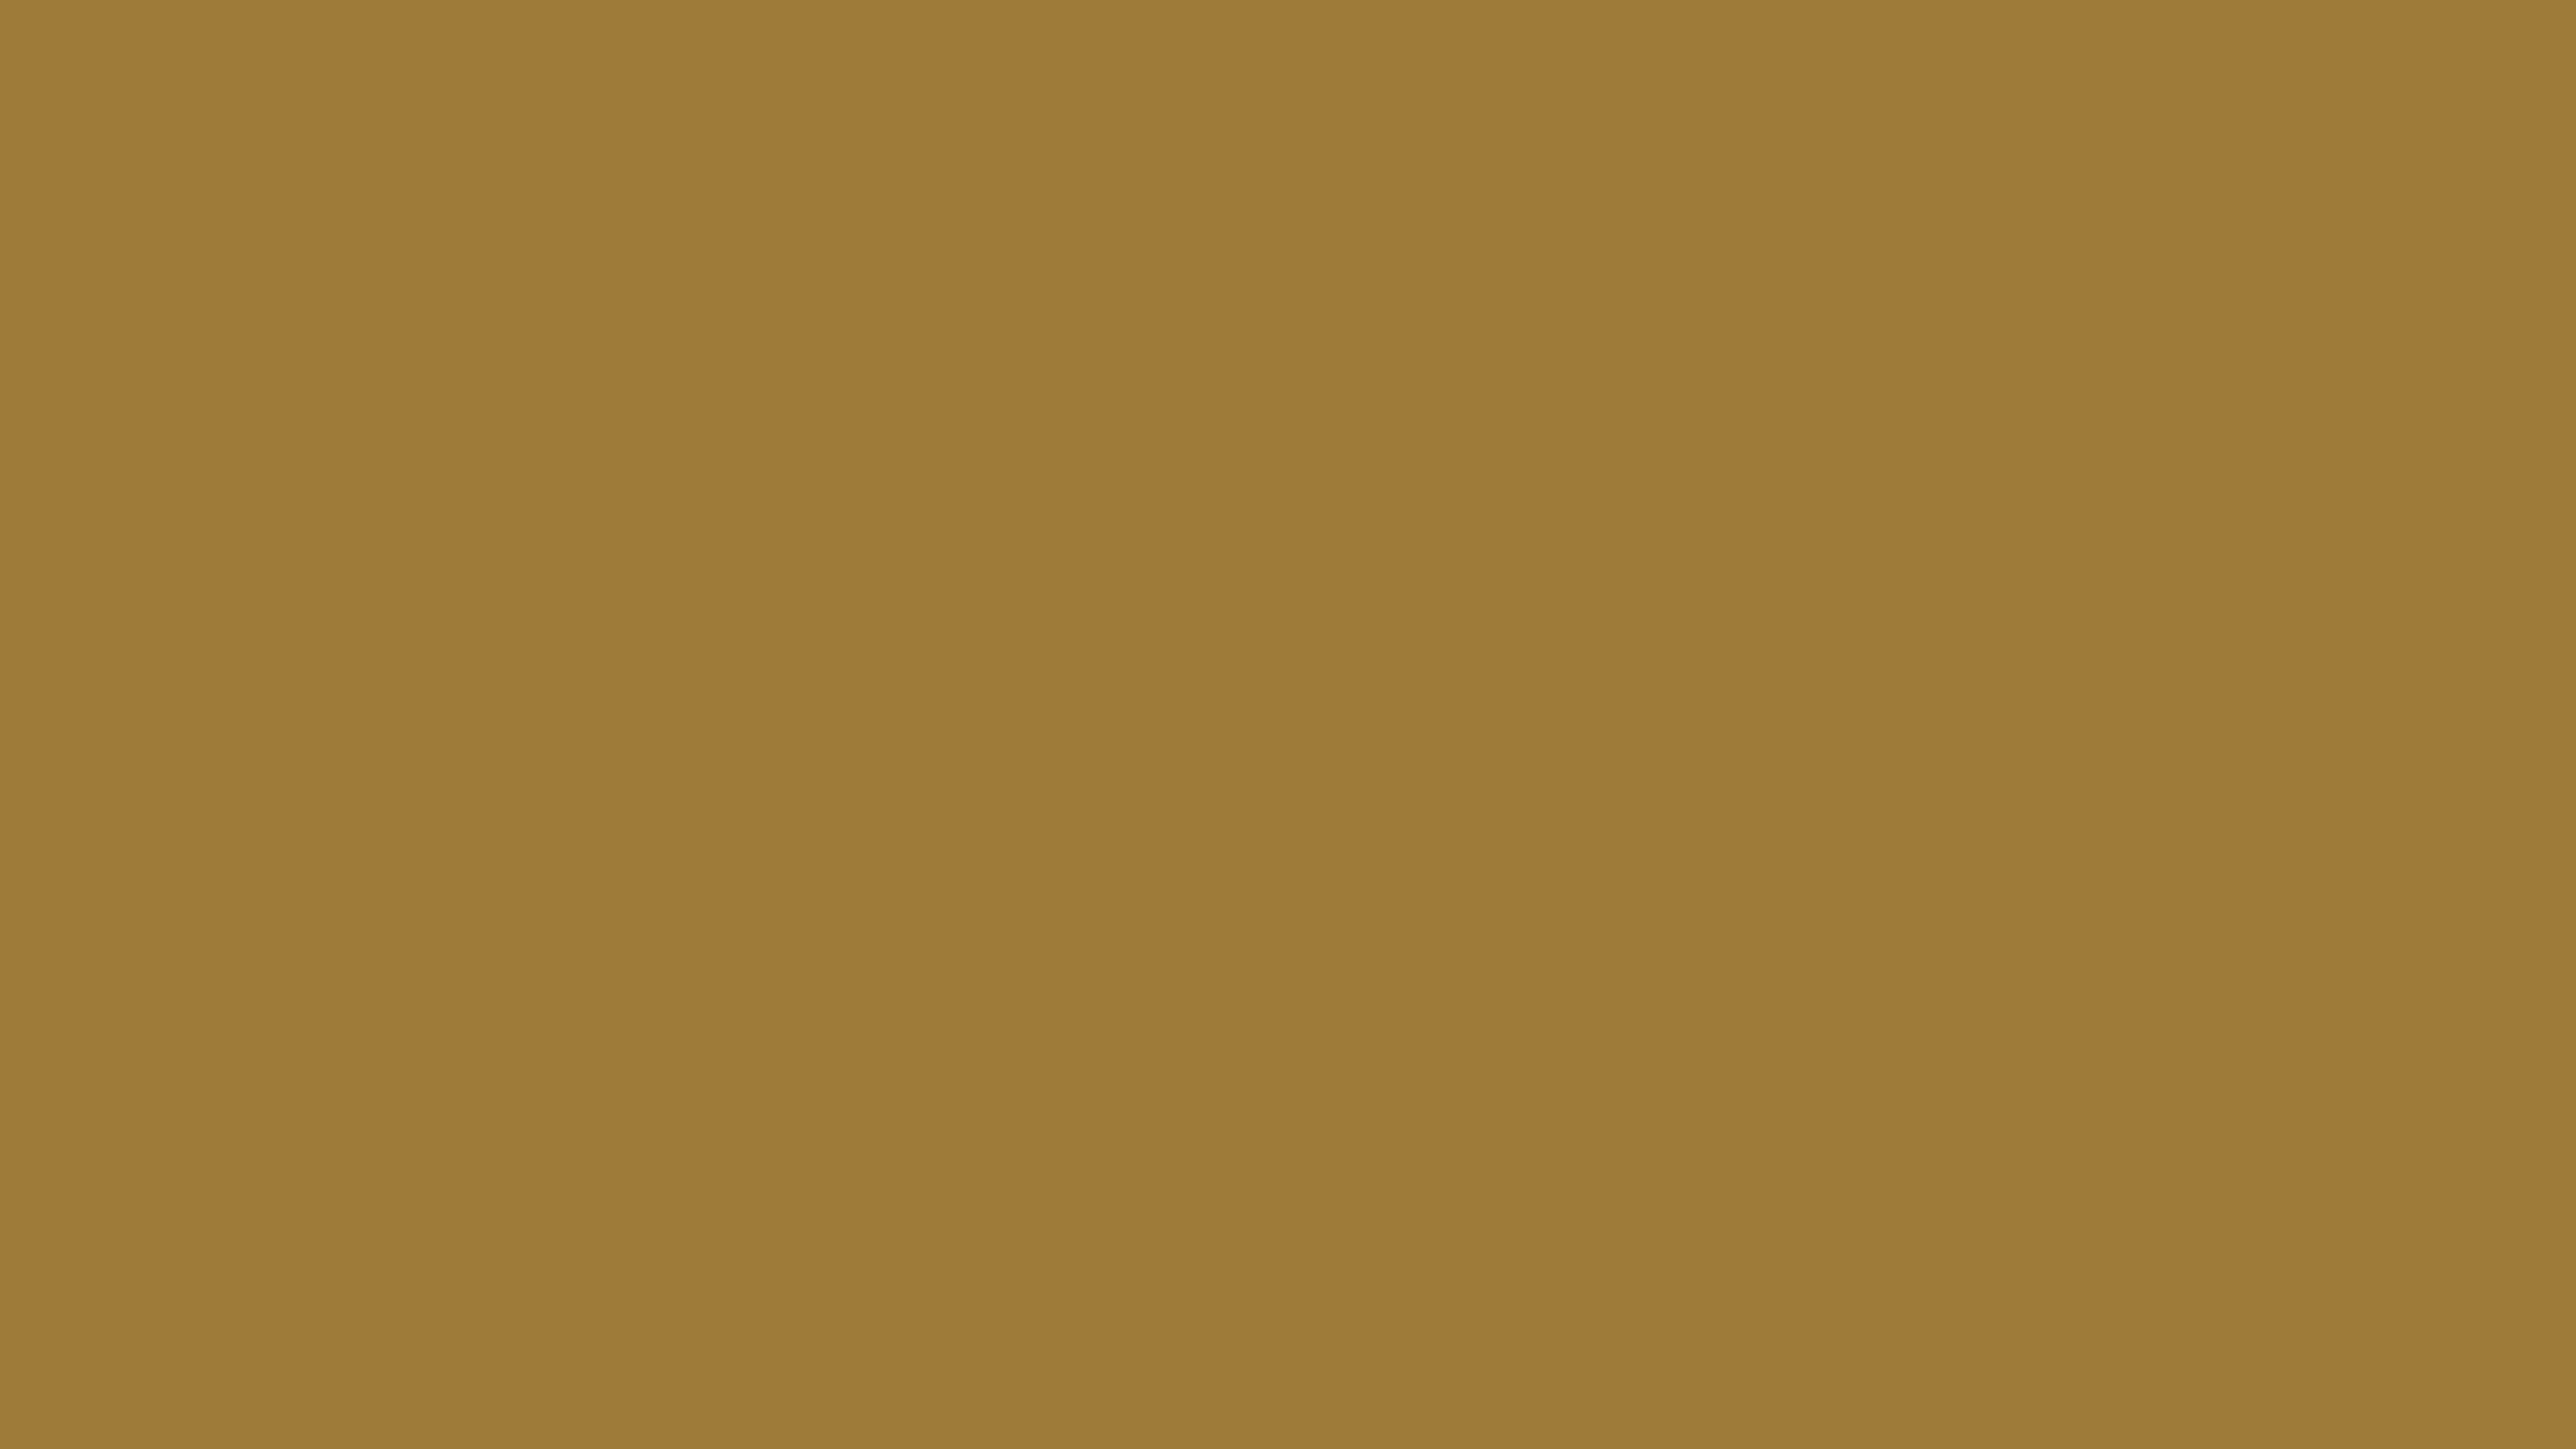 4096x2304 Metallic Sunburst Solid Color Background